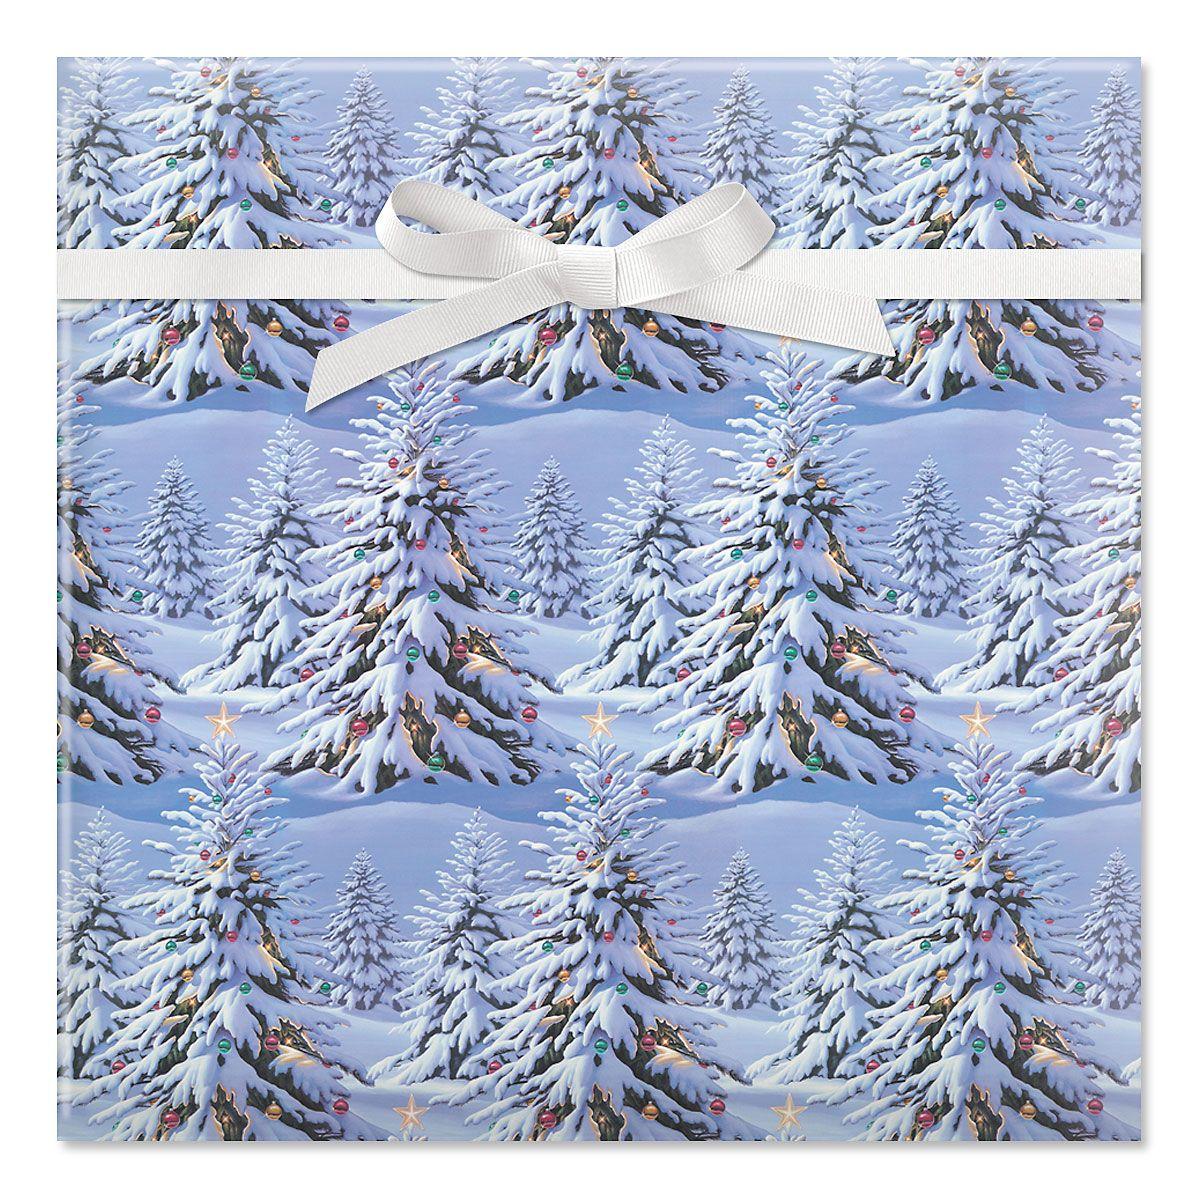 Snowy Tree Jumbo Rolled Gift Wrap